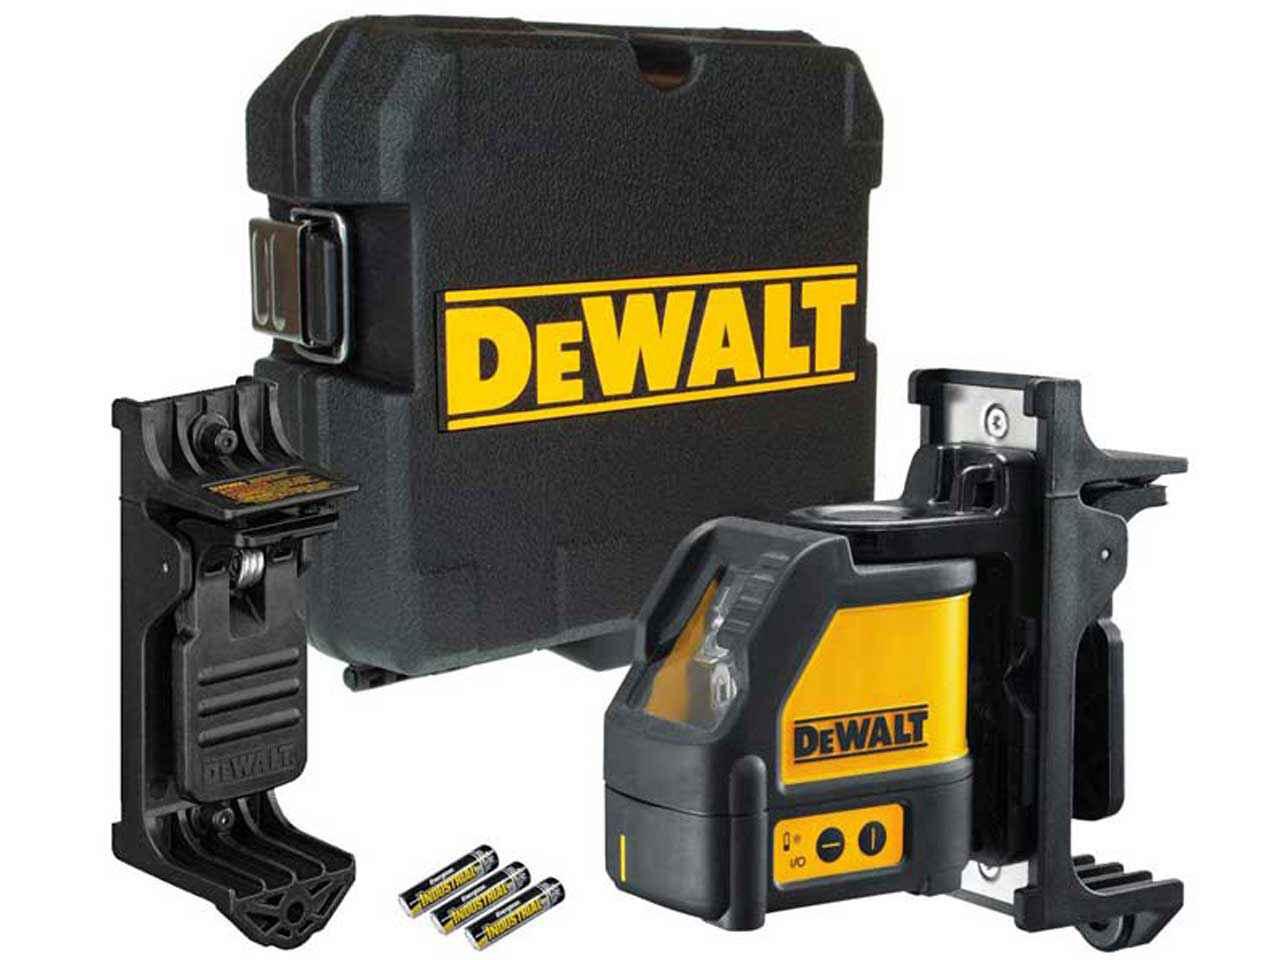 Dewalt_DW088K2.jpg